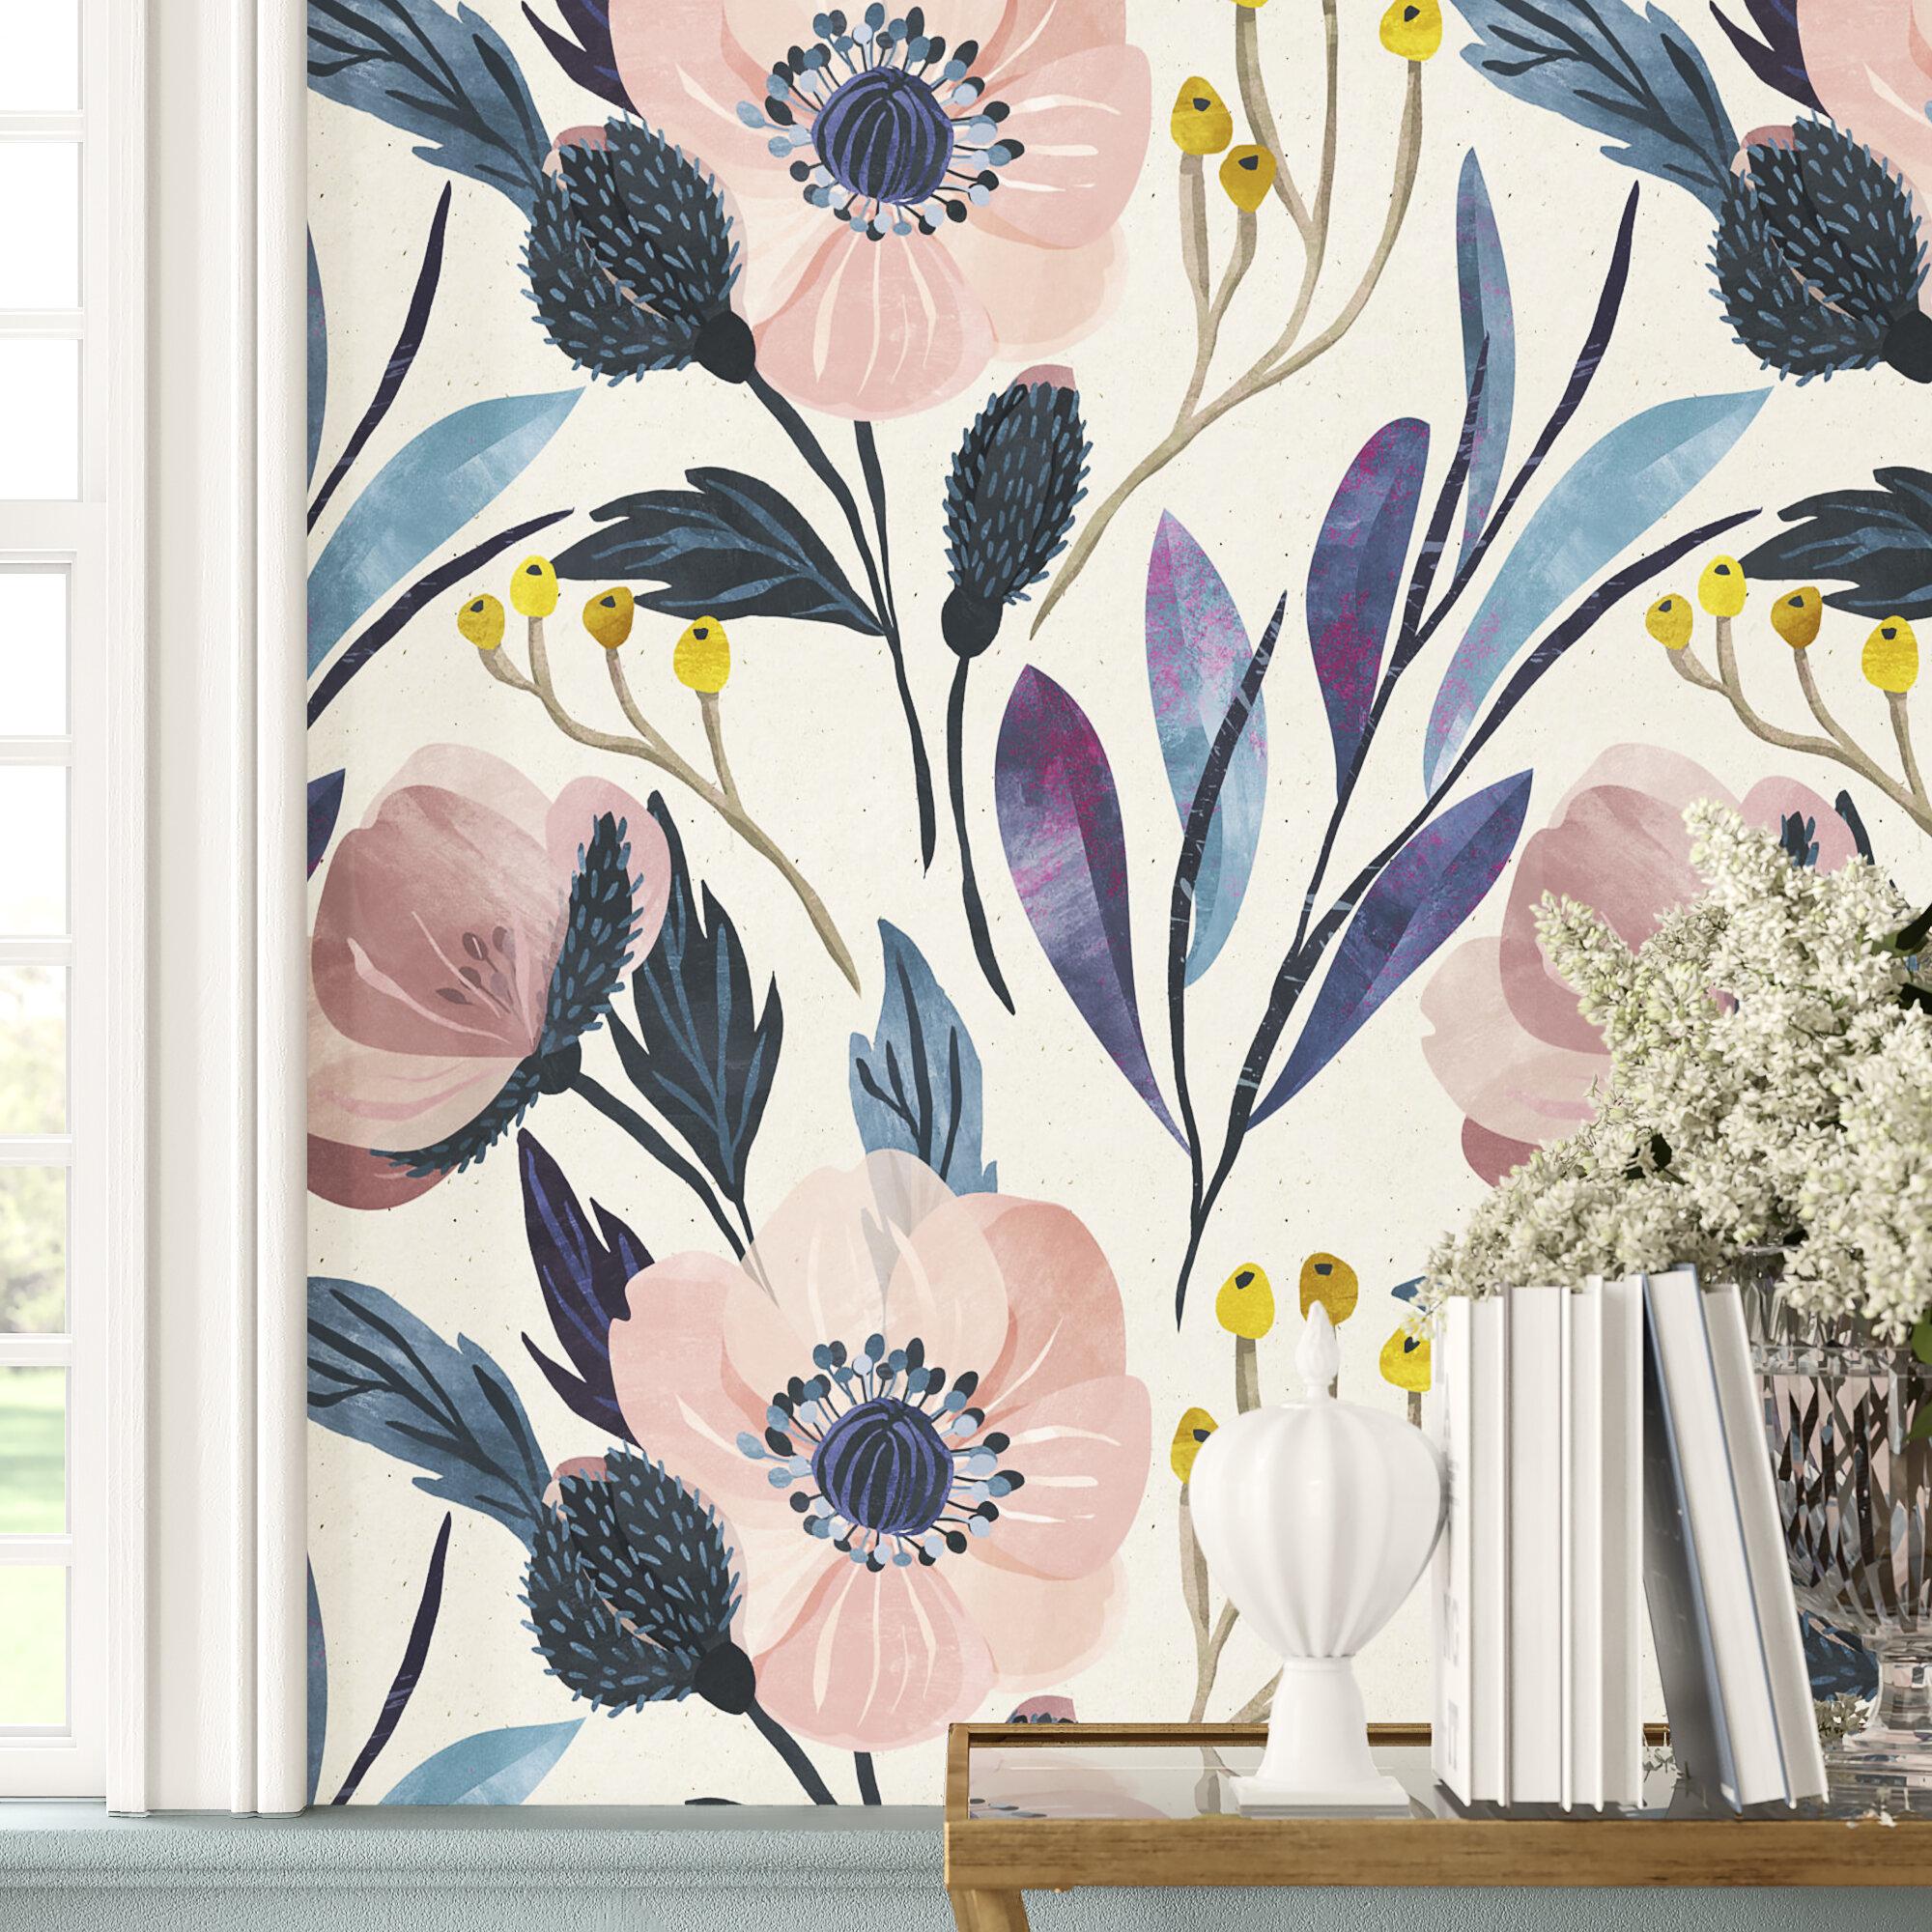 Floral Botanical Self Adhesive Wallpaper You Ll Love In 2020 Wayfair